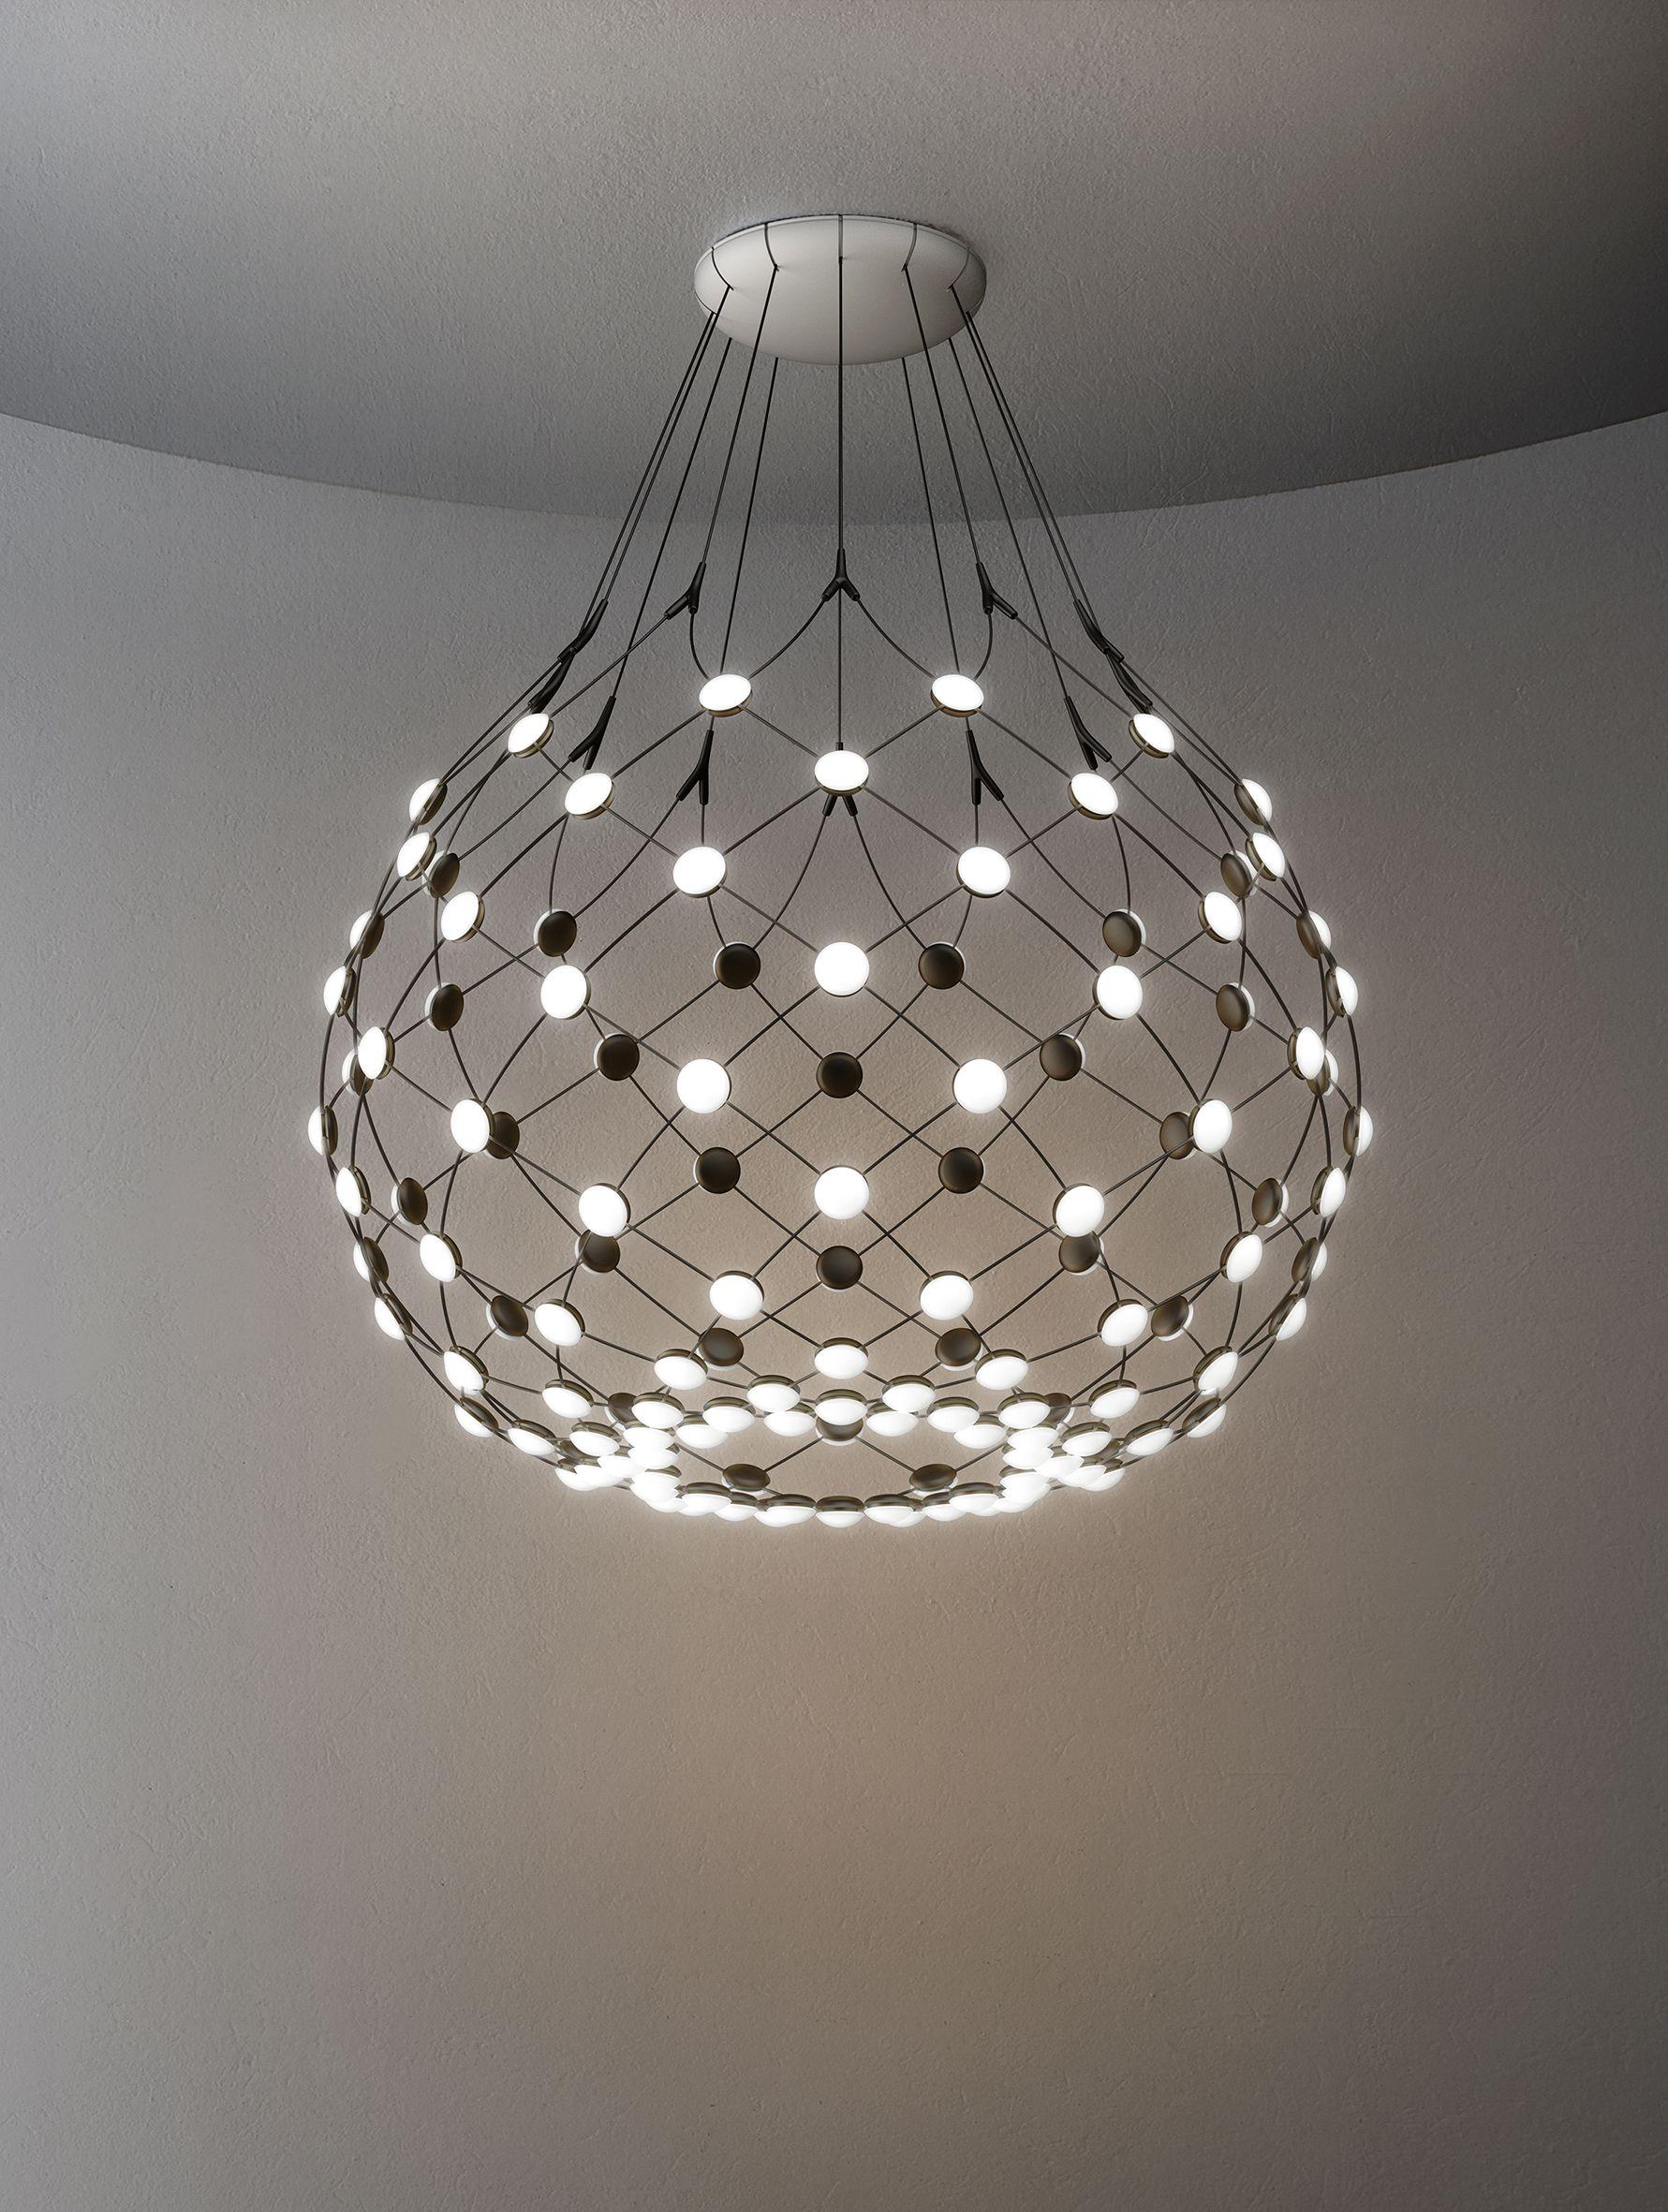 Luceplan MESH lamp by Francisco Gomez Paz